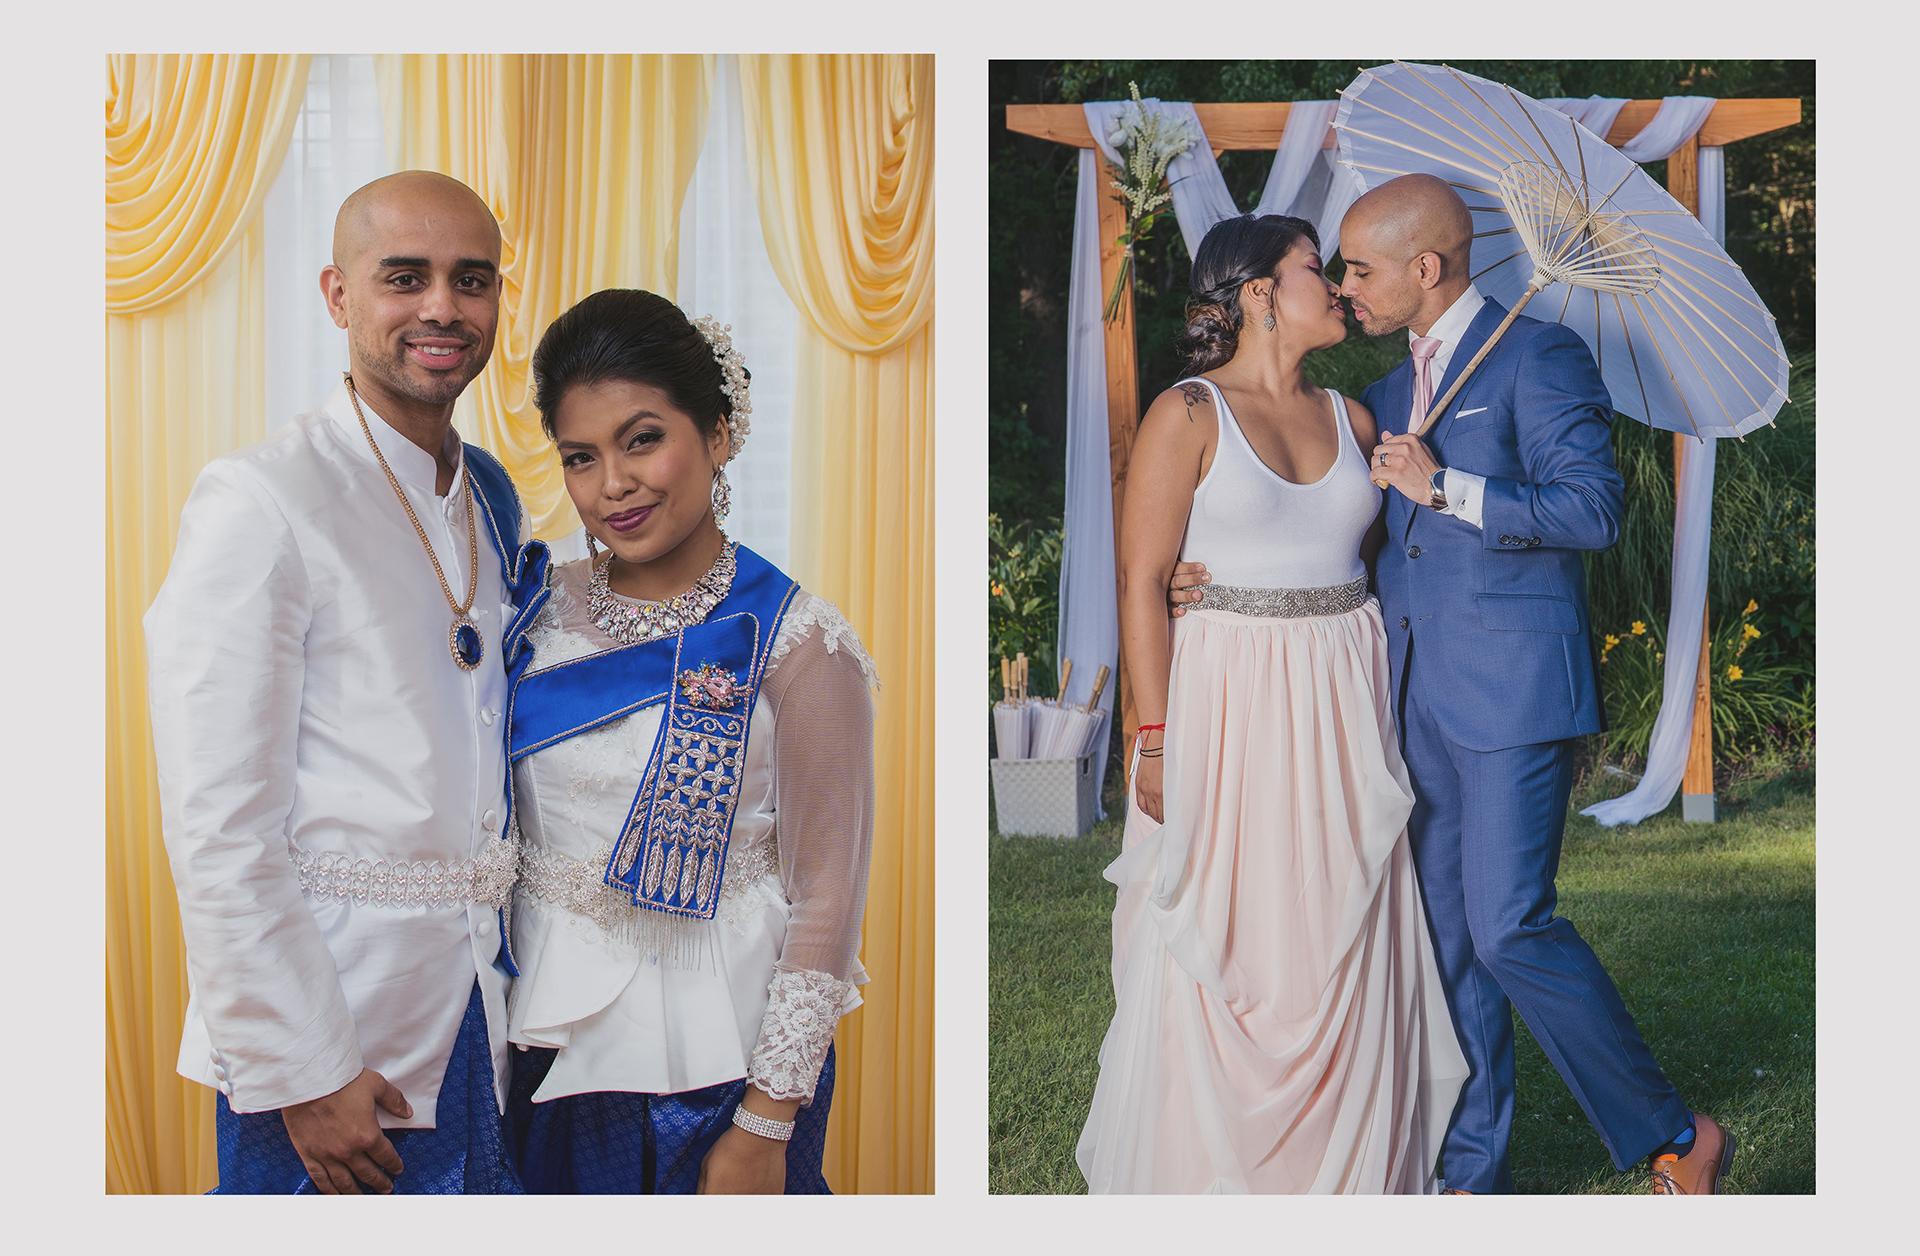 bory-wedding 4 copy.jpg